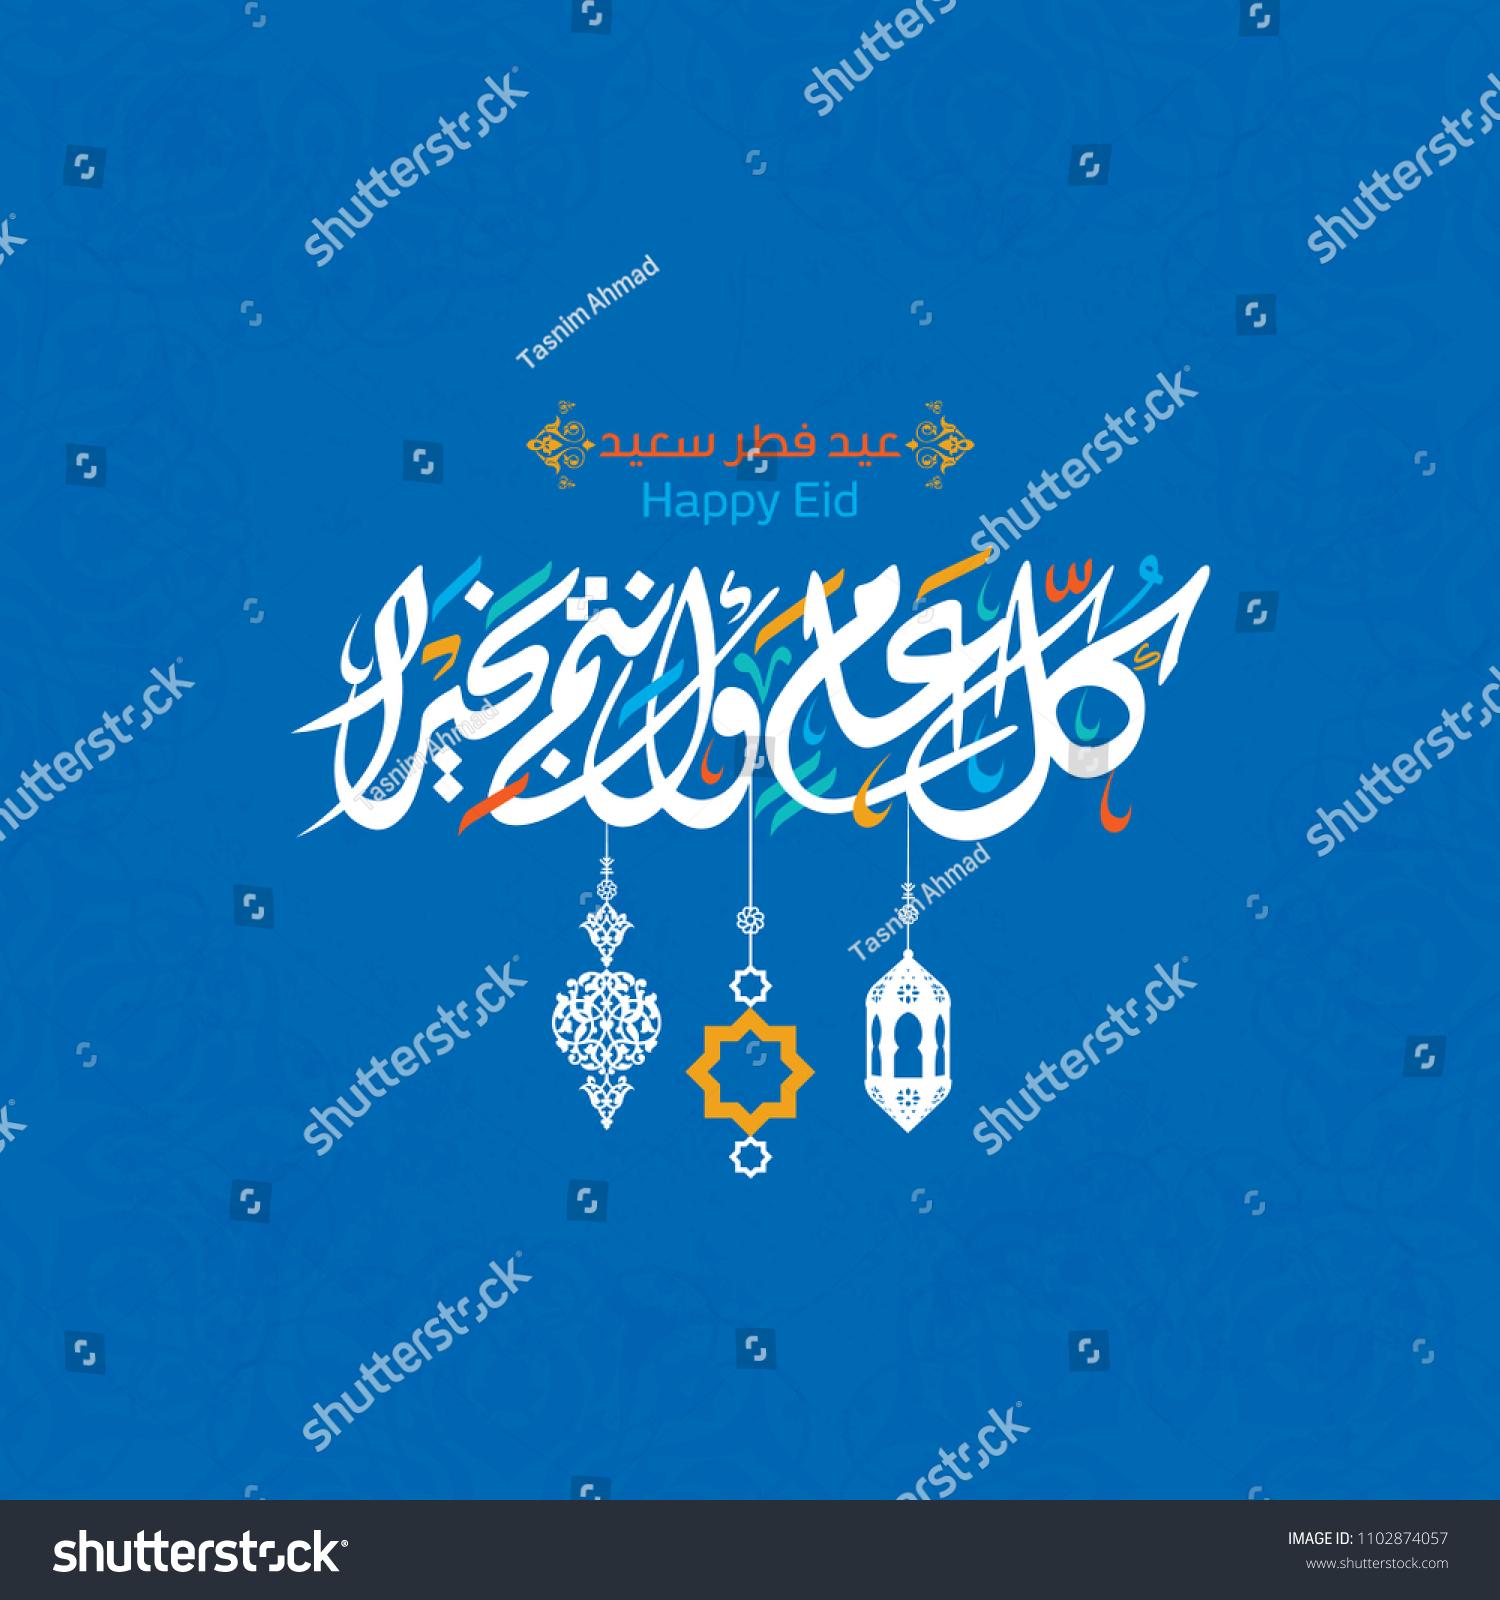 Happy eid eid mubarak greeting card stock vector royalty free happy of eid eid mubarak greeting card in arabic calligraphy 7 m4hsunfo